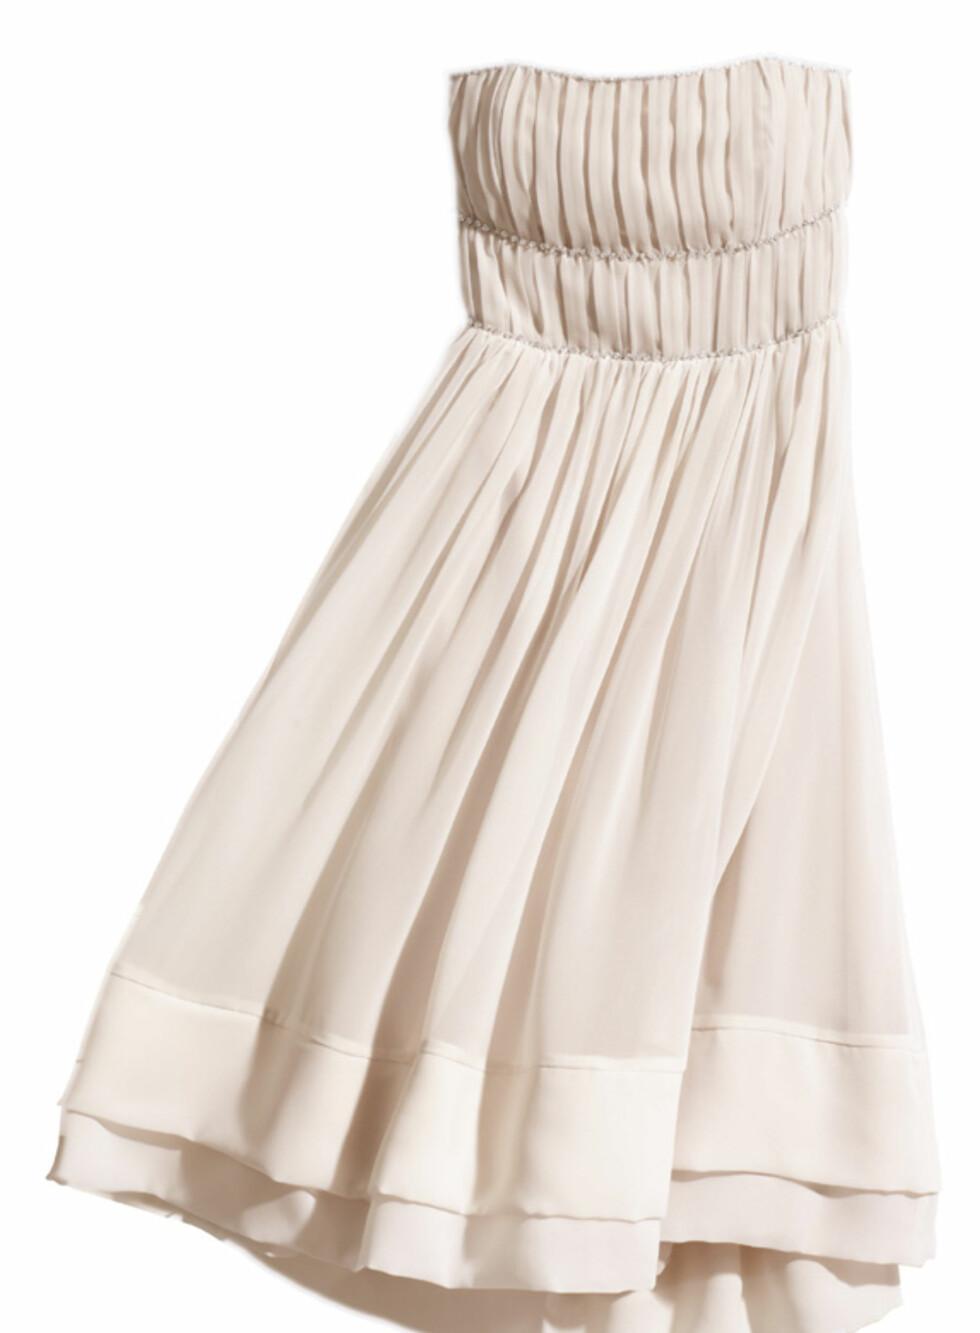 Pudderrosa stroppeløs kjole (kr.399). Foto: H&M